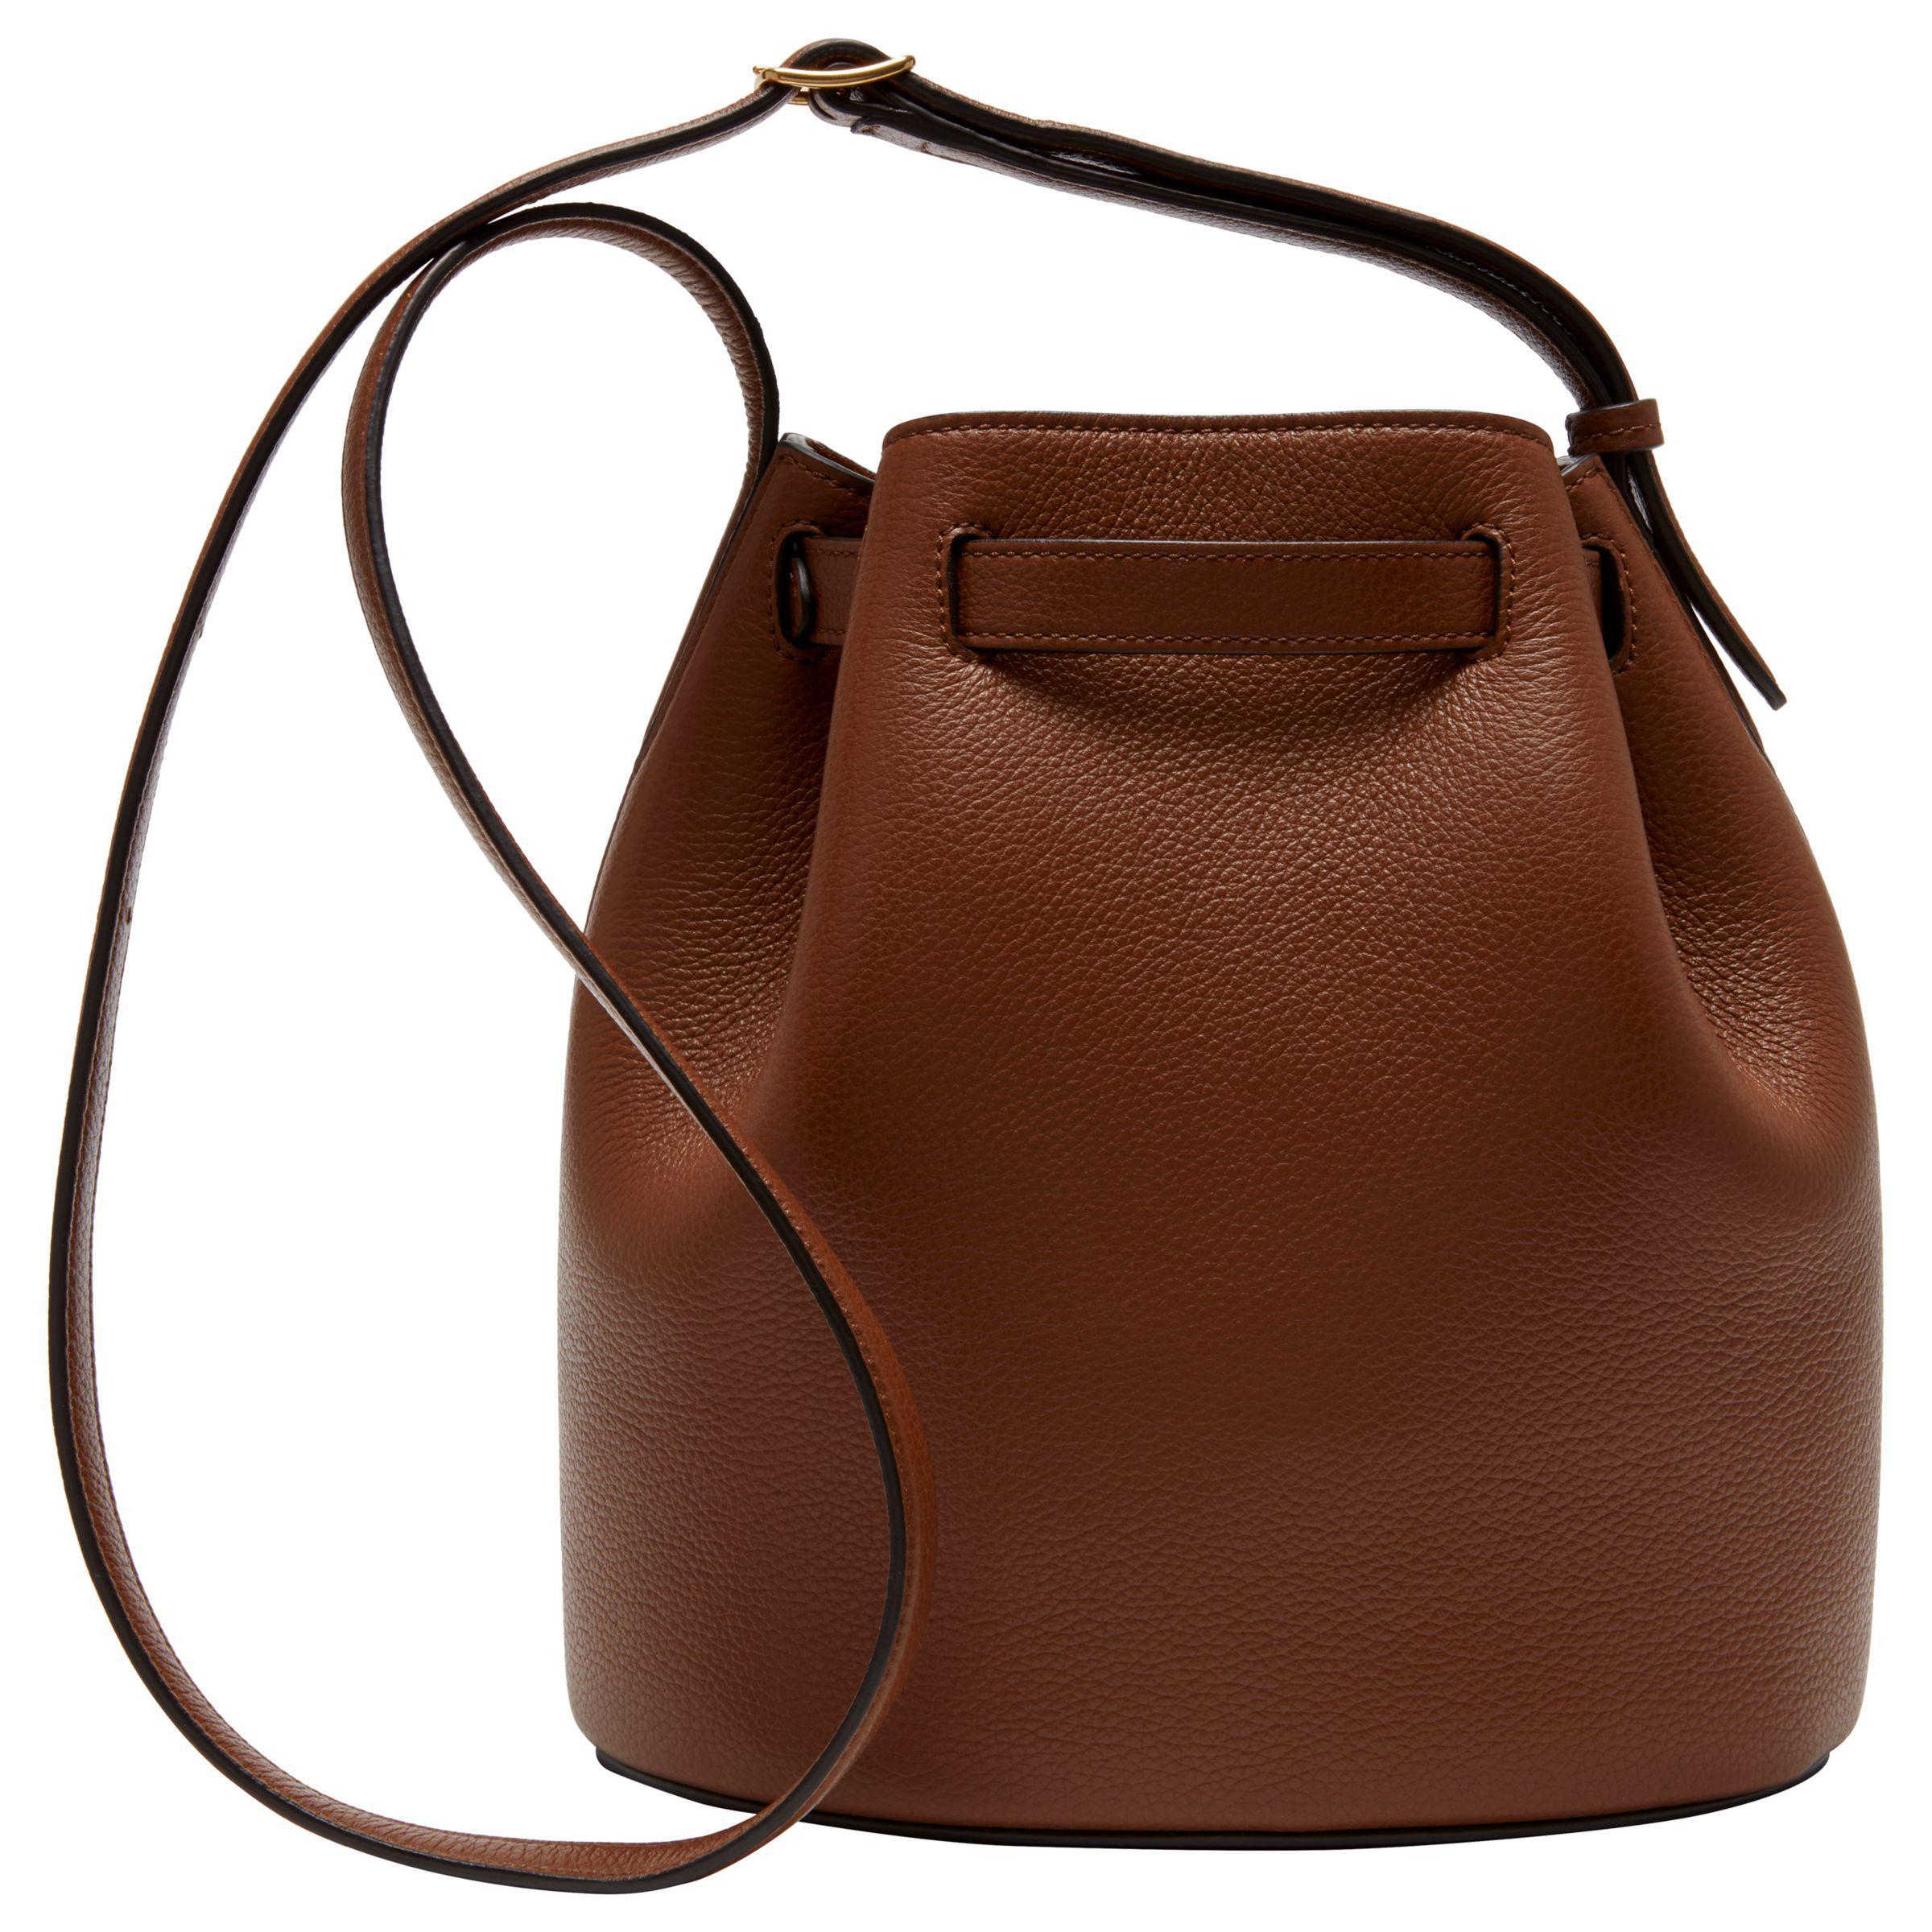 778b9b92d1d Mulberry Handbags John Lewis Handbag Photos Eleventyone. Gallery. John  Lewis Mulberry Bayswater Small Clic Grain Leather Zipped Bag